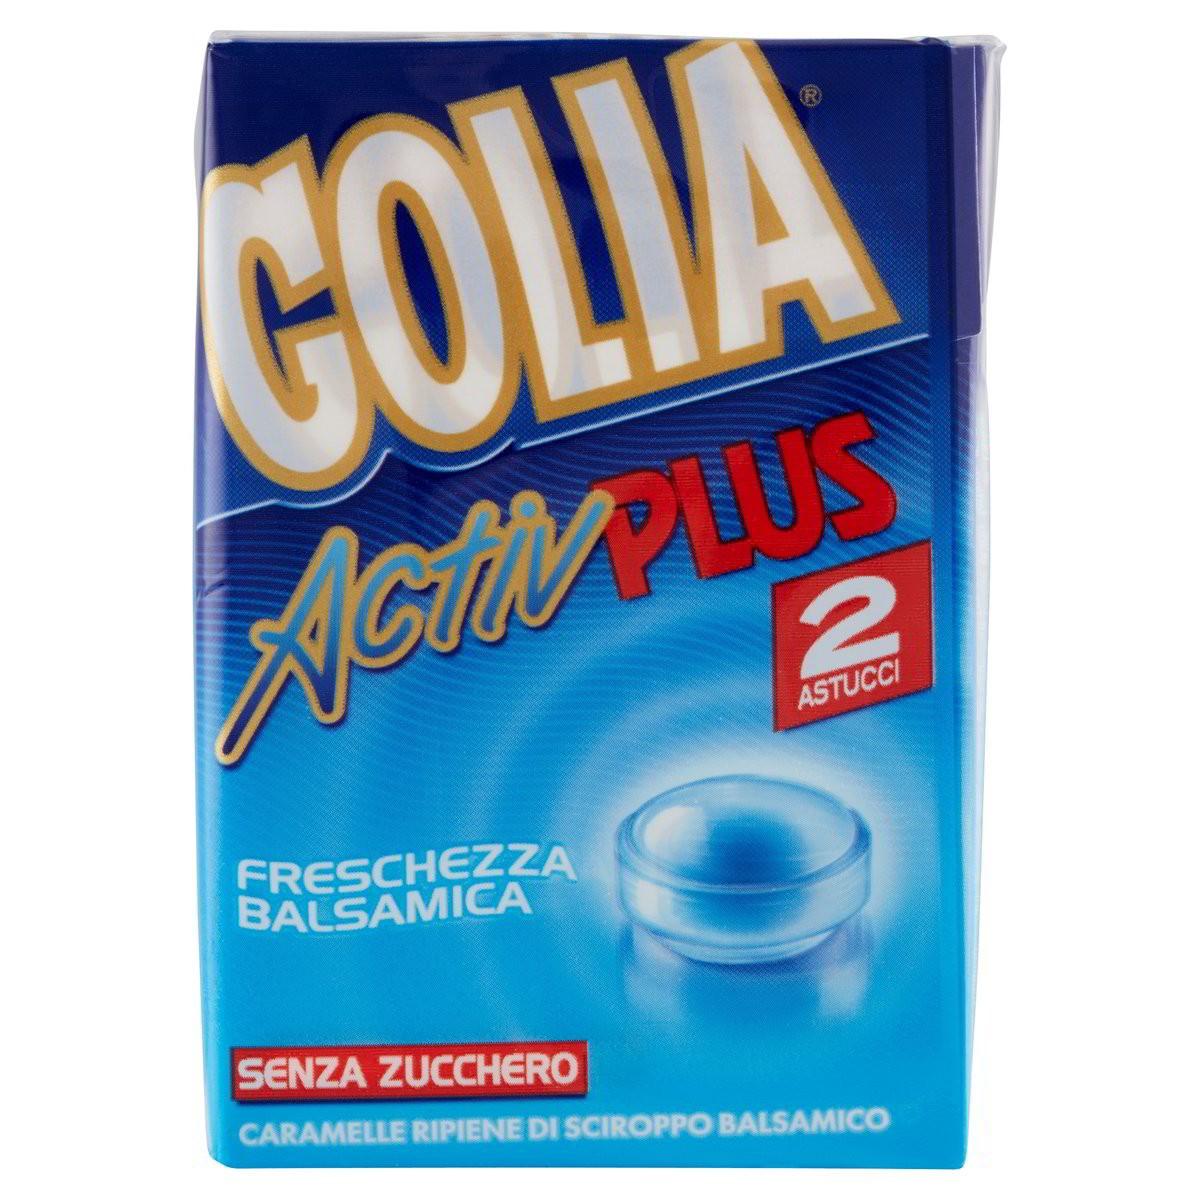 Caramelle Golia Active Plus